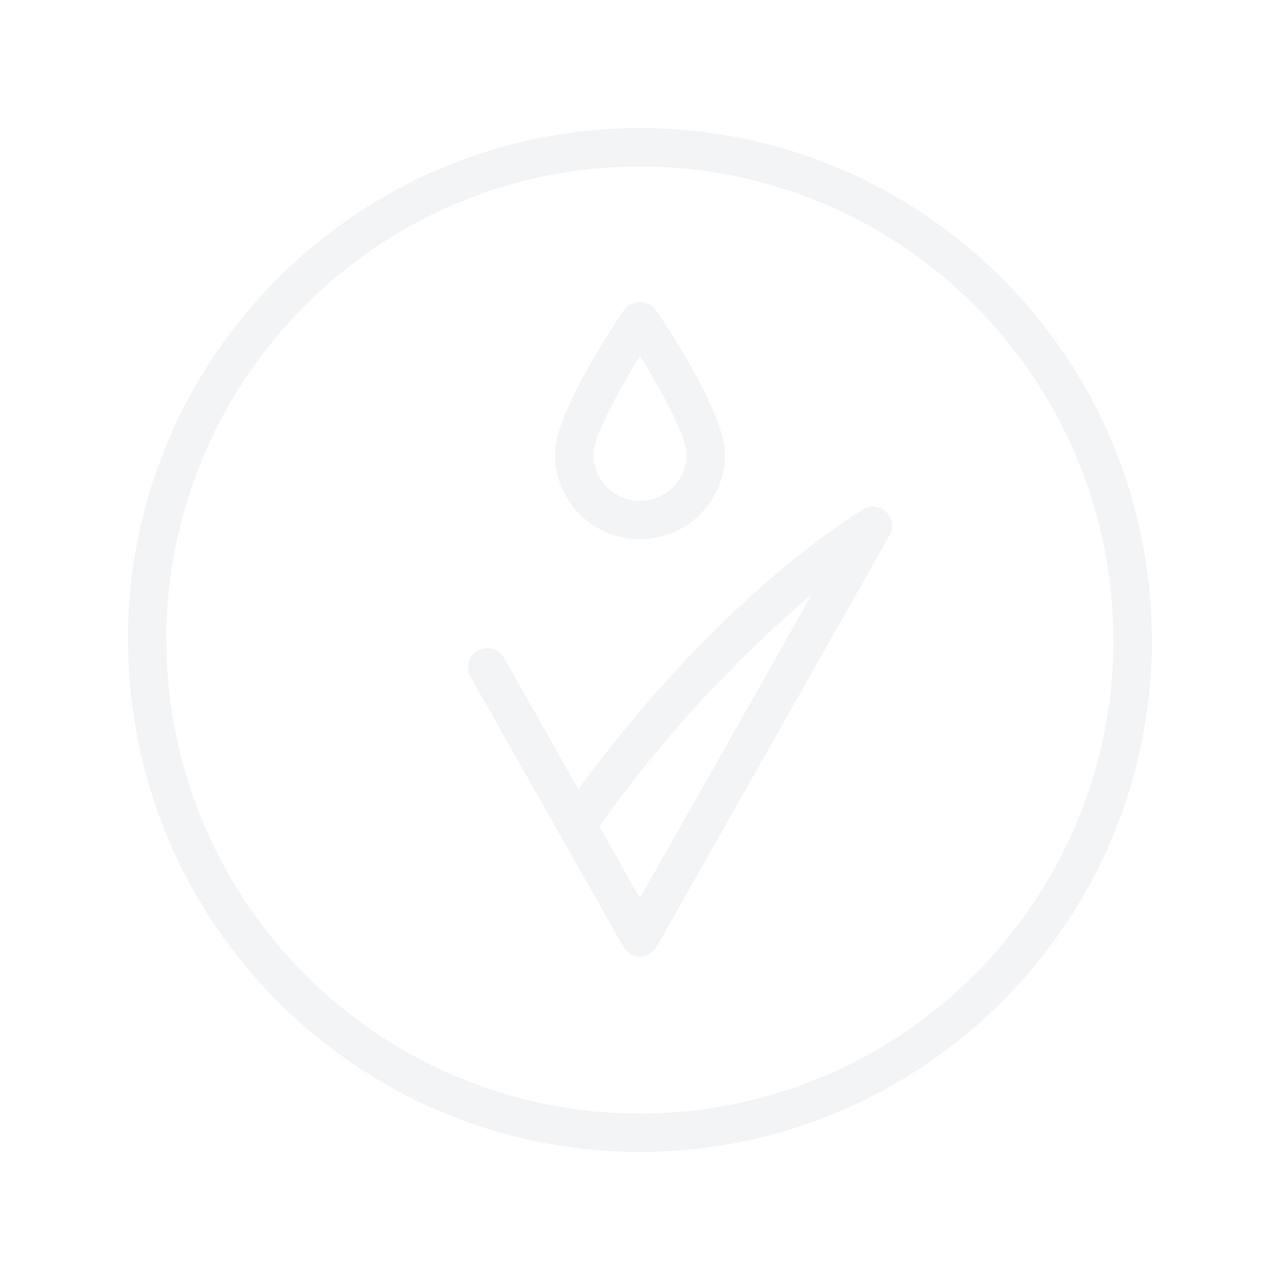 LA ROCHE-POSAY Substiane Replenishing Care (Normal/ Dry Skin) 40ml